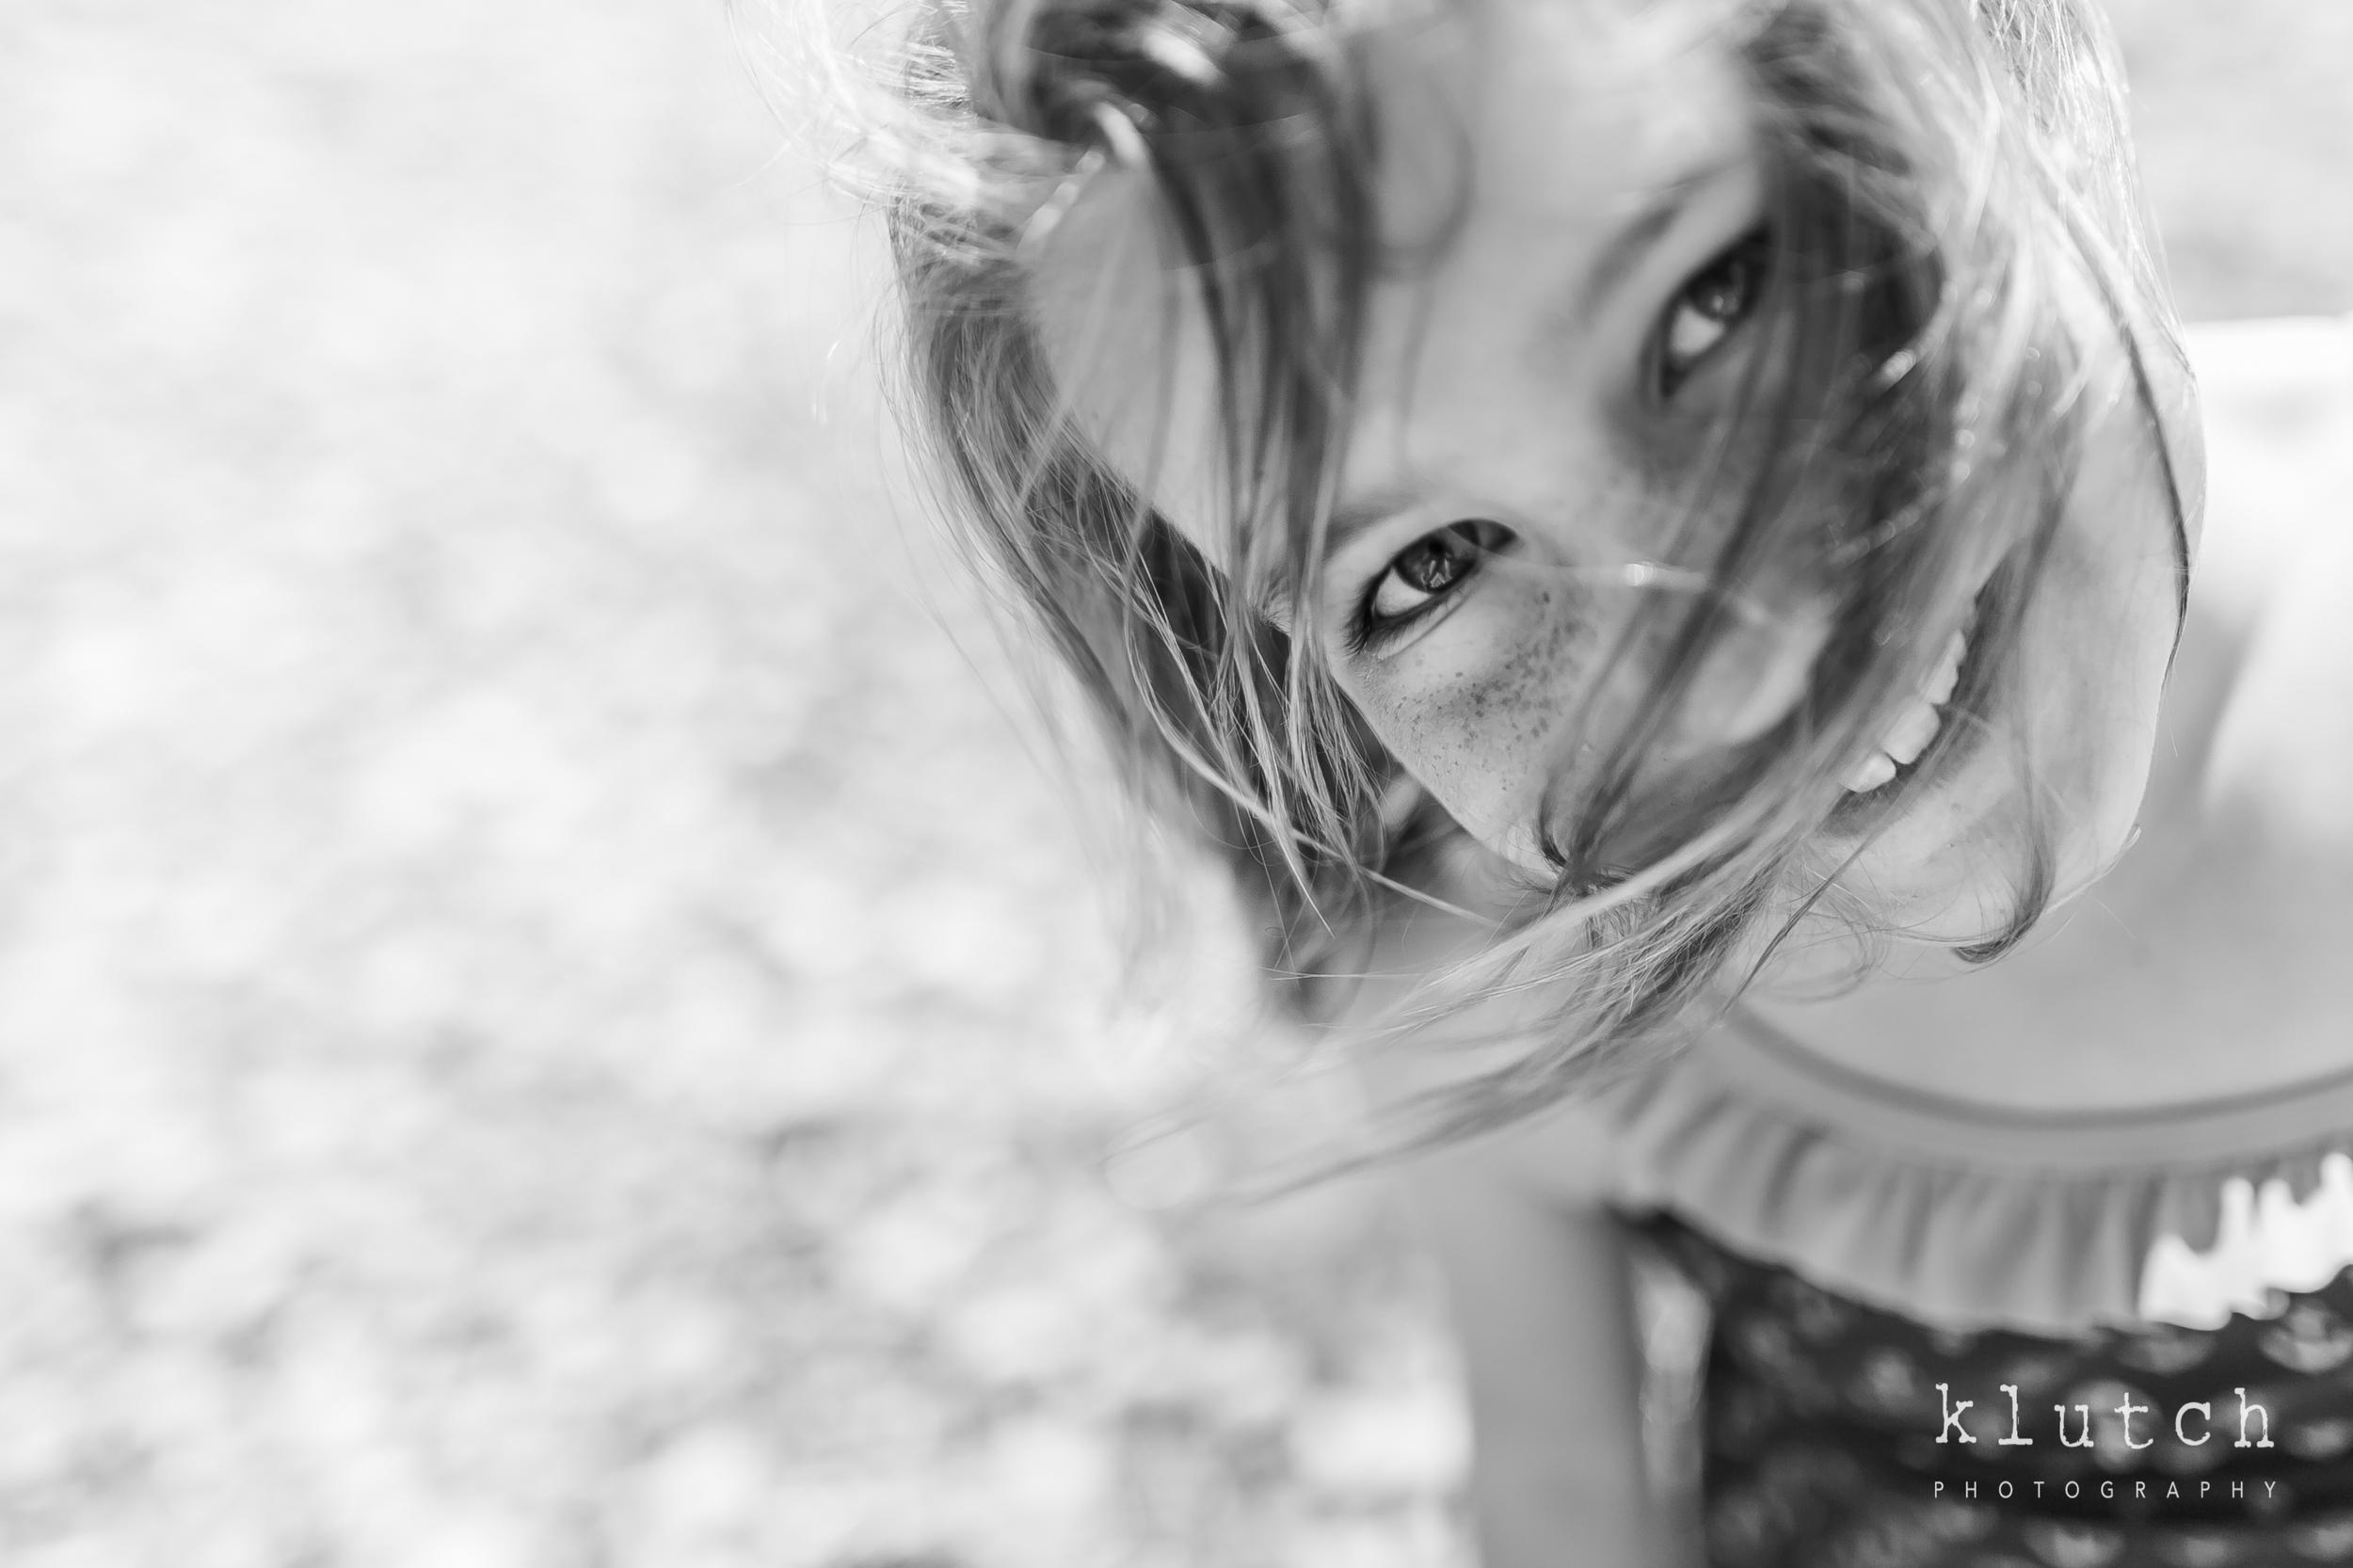 Klutch Photography,white rock family photographer, vancouver family photographer, whiterock lifestyle photographer, life unscripted photographer, life unscripted session, photography,Dina Ferreira Stoddard-5960.jpg